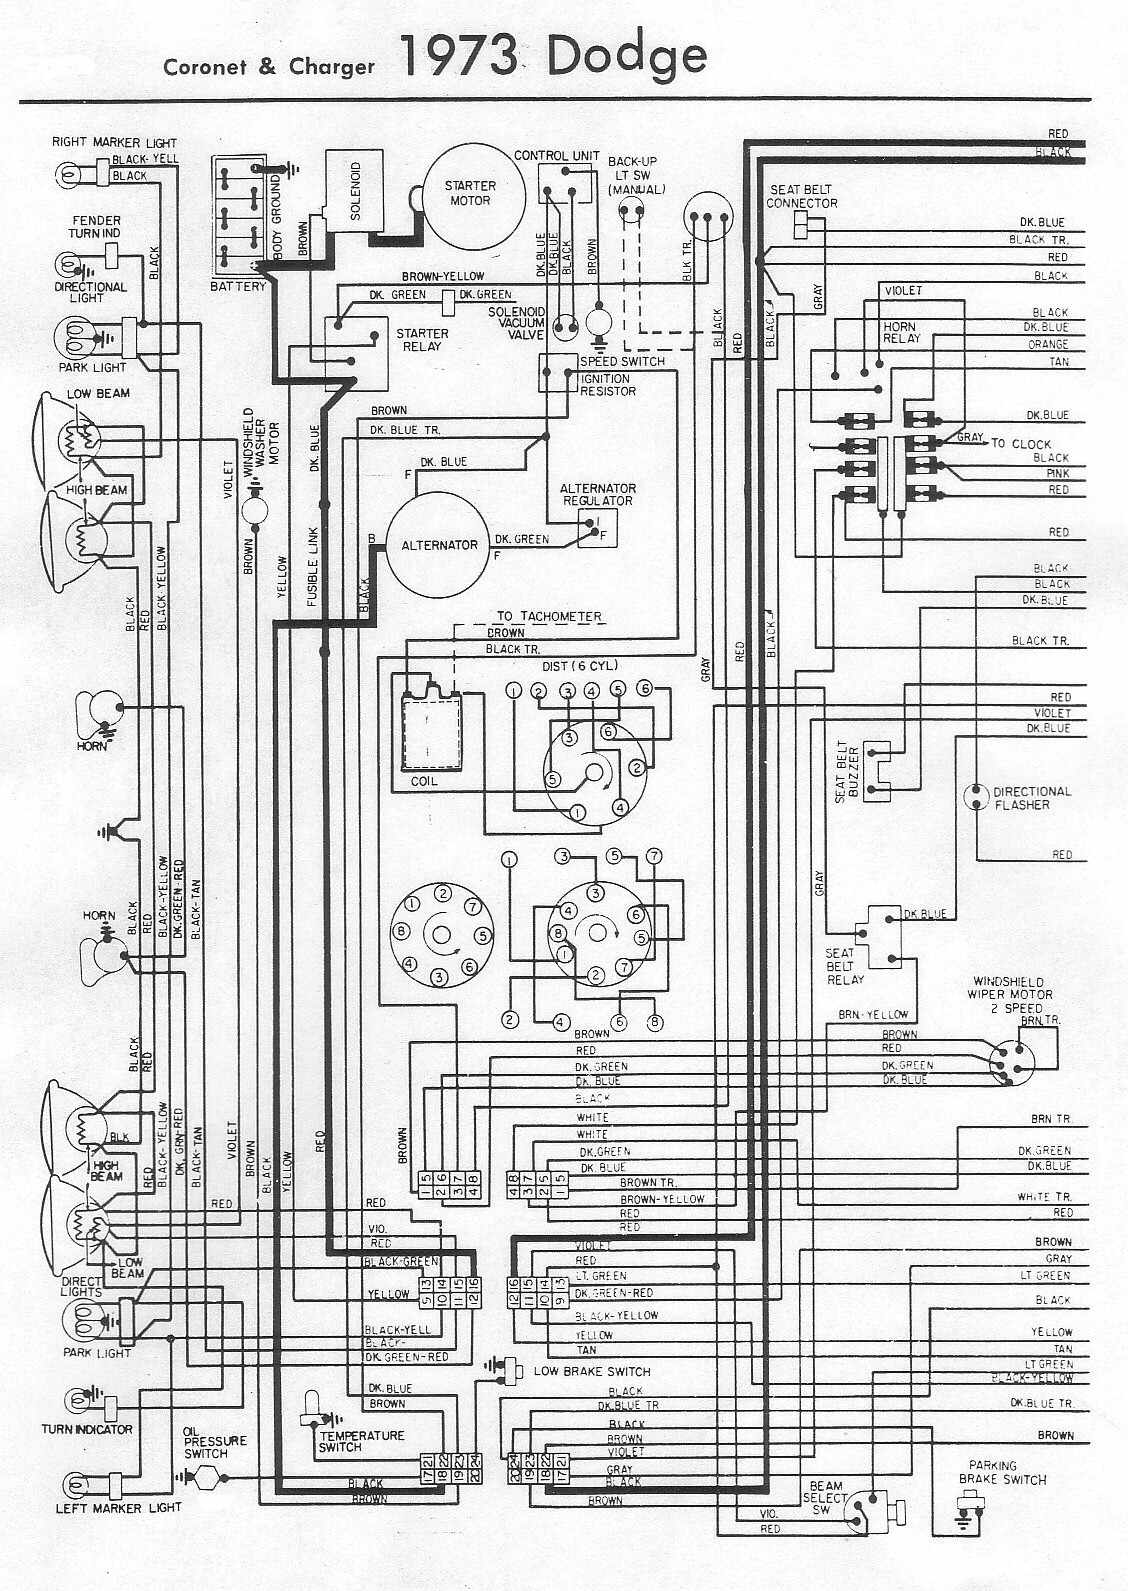 Citroen C2 Headlight Wiring Diagram Schematics C1 Trusted Car Data